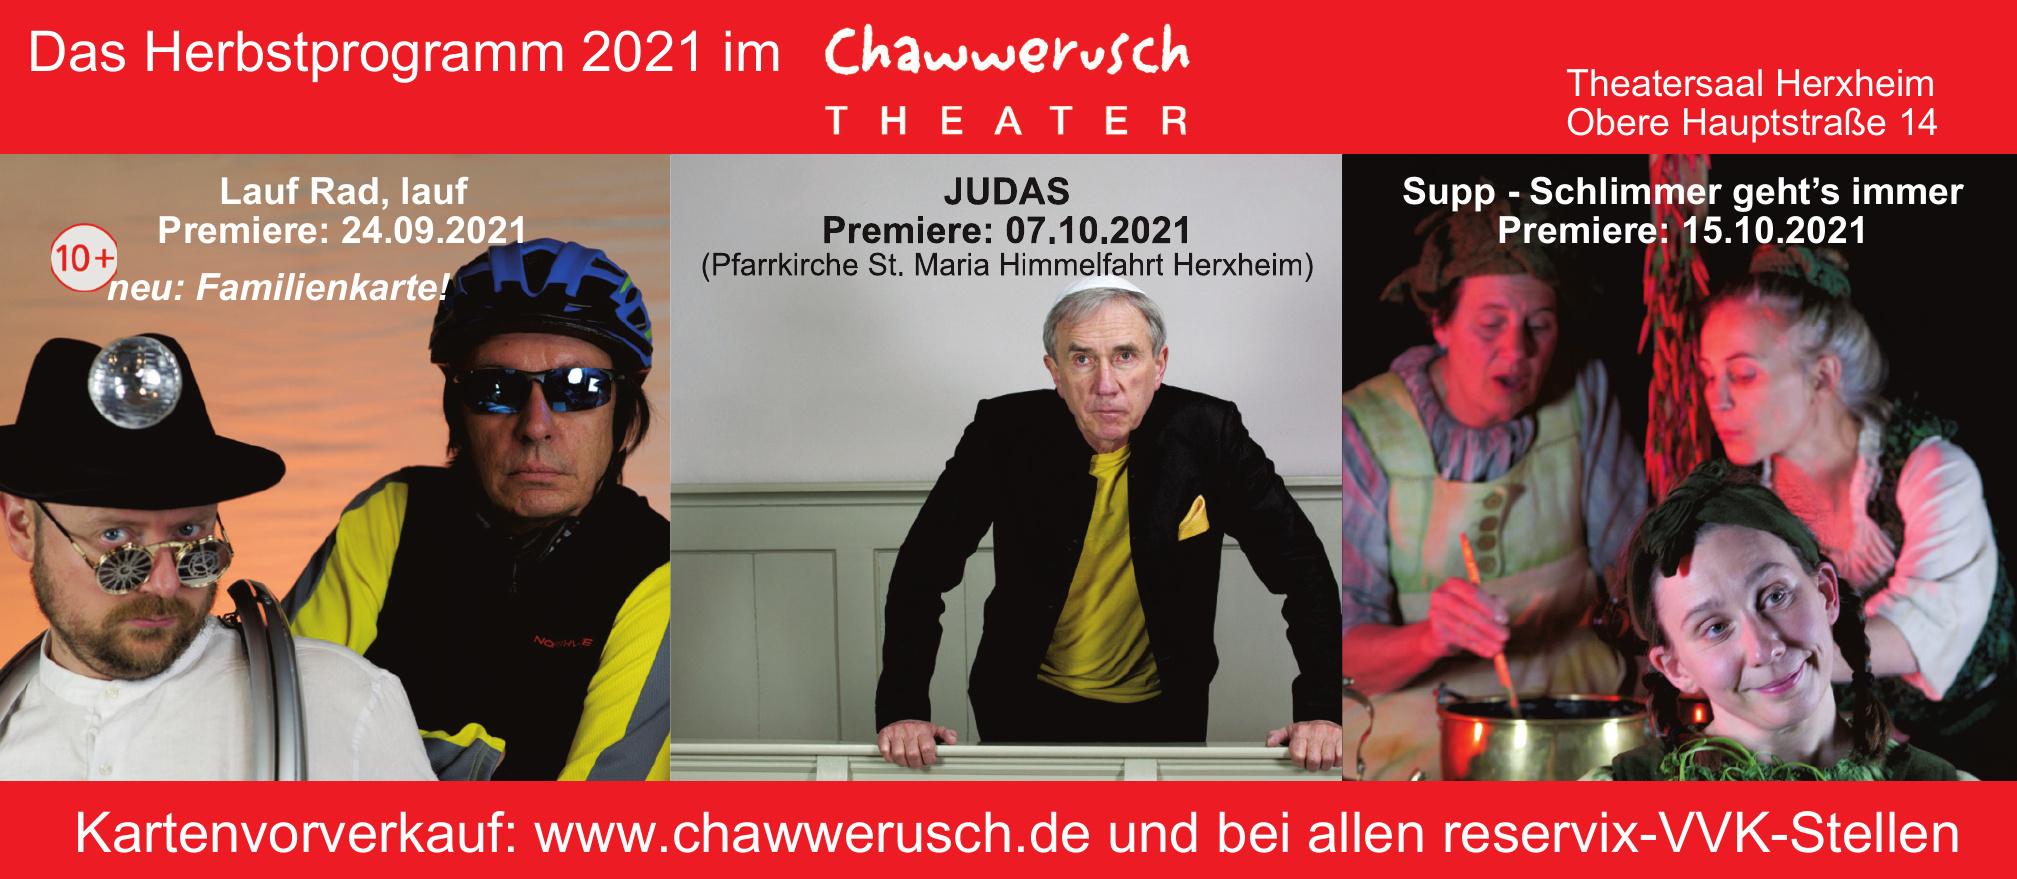 Chawwerusch Theatersaal